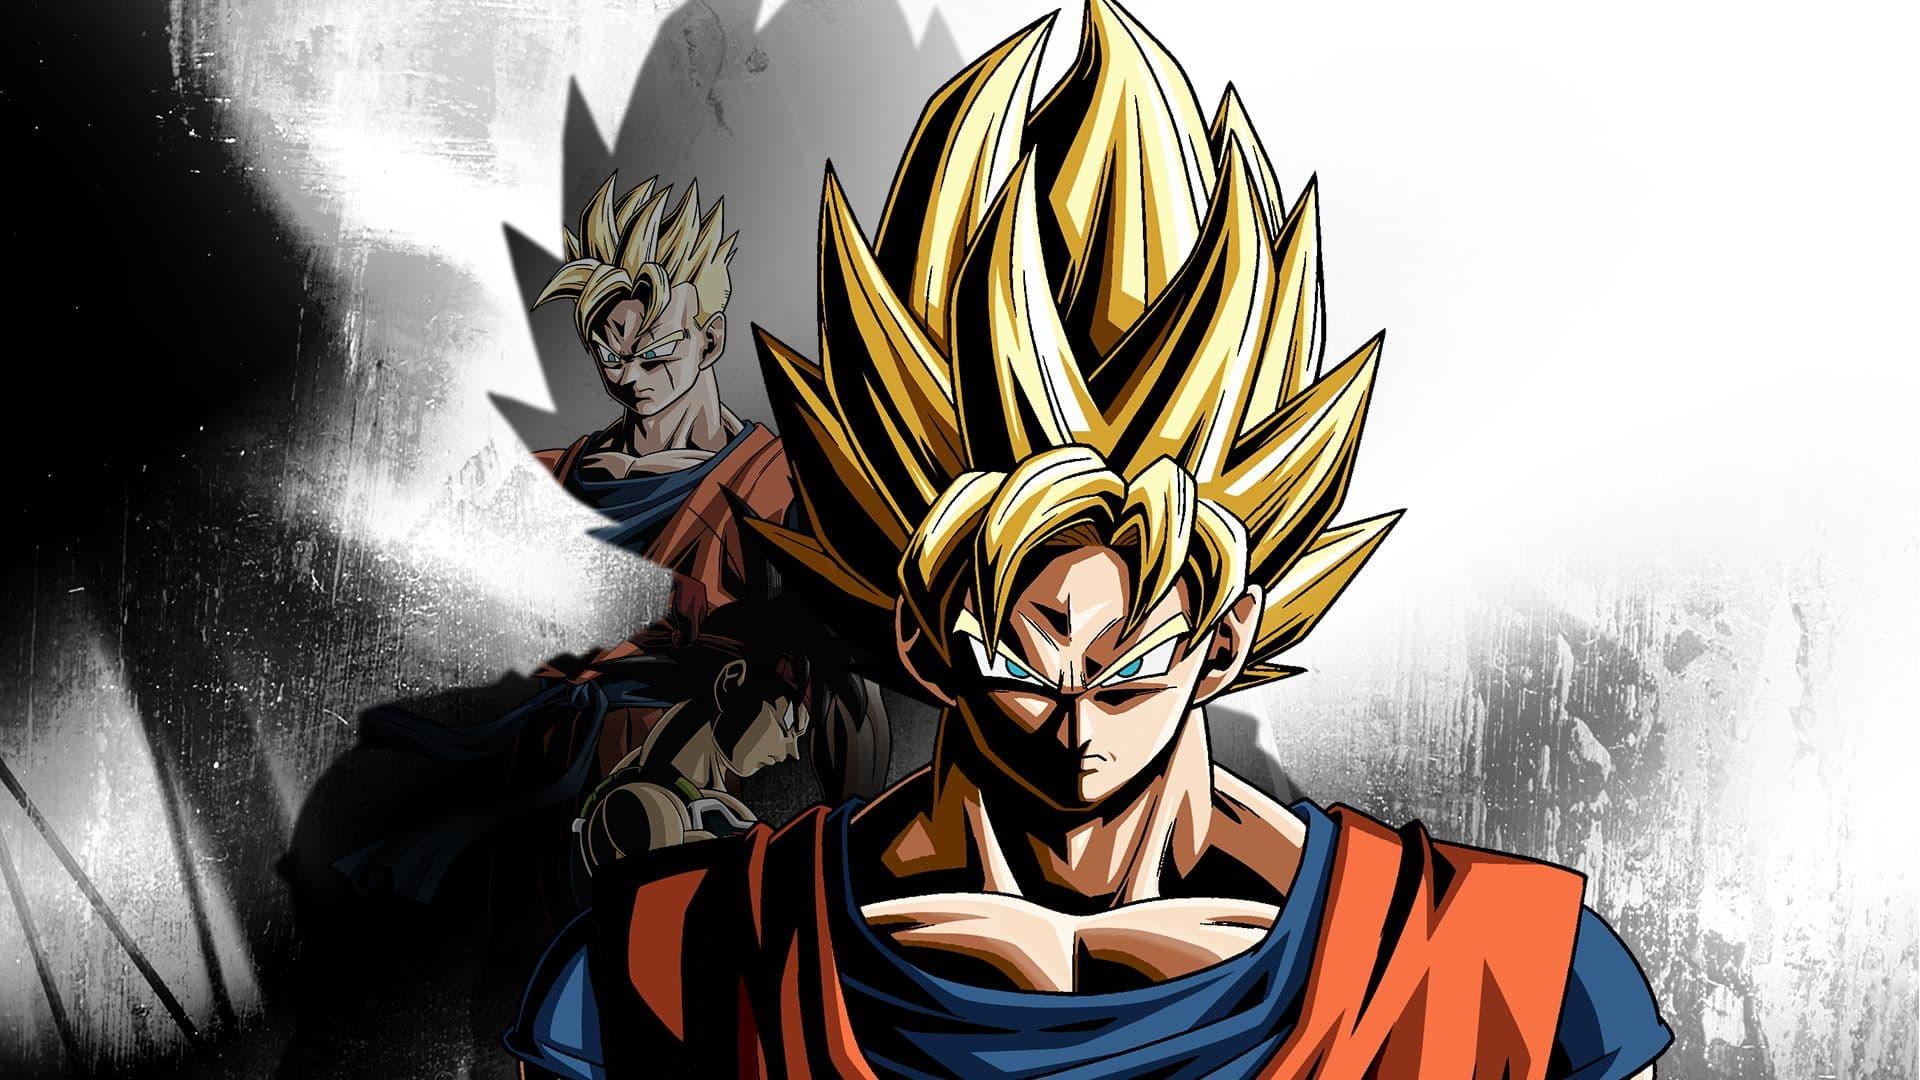 متطلبات تشغيل Dragon Ball Xenoverse 2